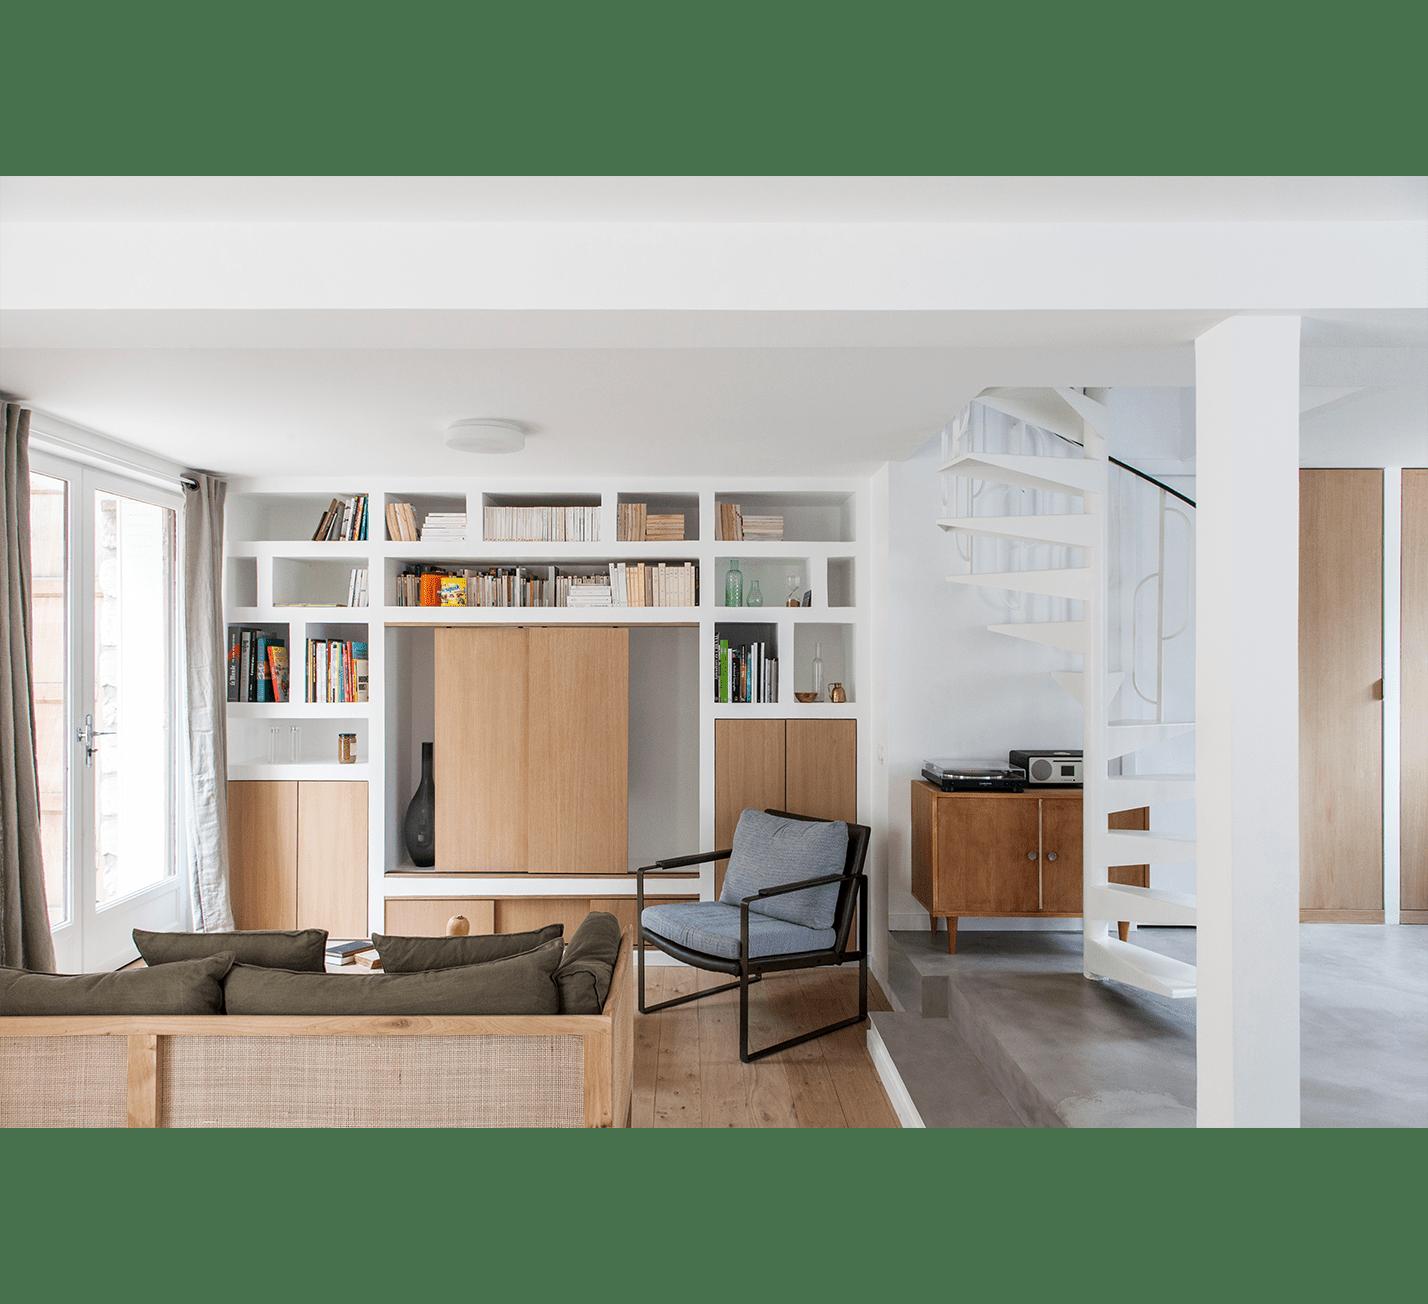 Projet-Germaine-Atelier-Steve-Pauline-Borgia-Architecte-interieur-01-min